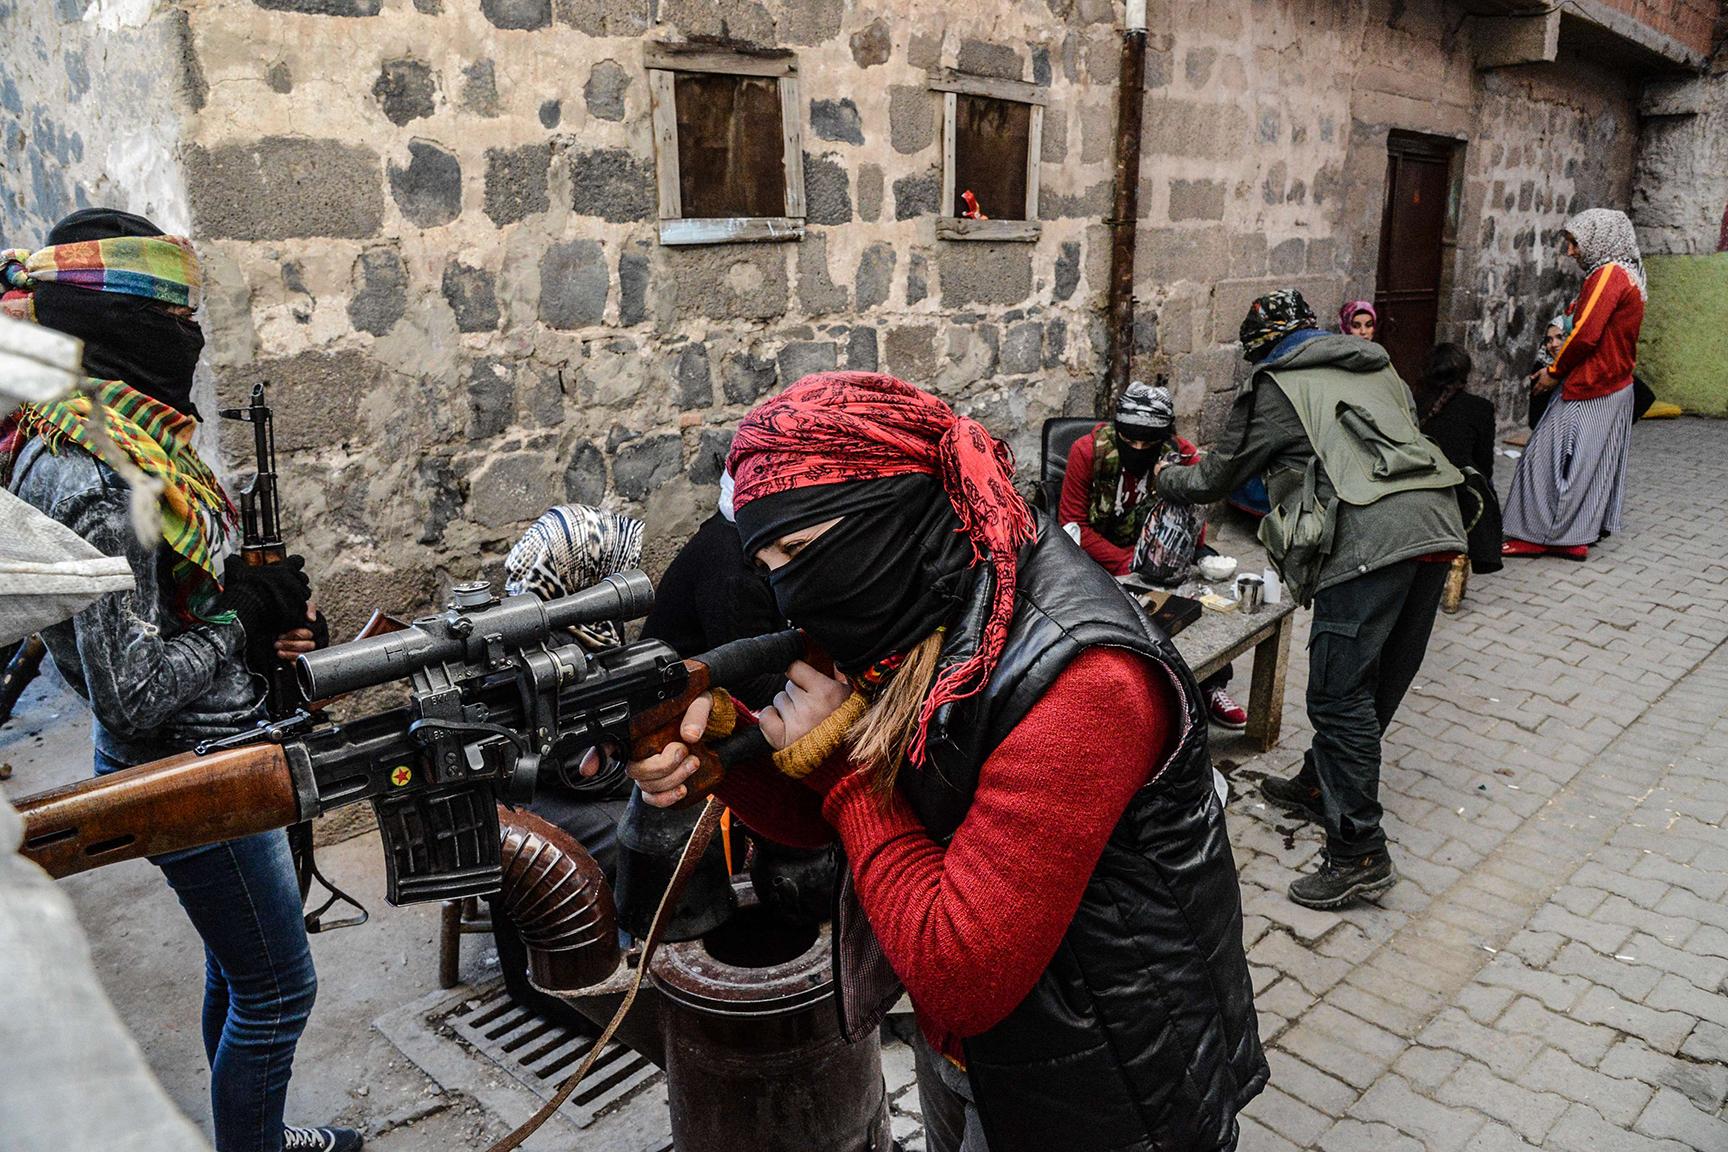 Armed Kurdish women millitants